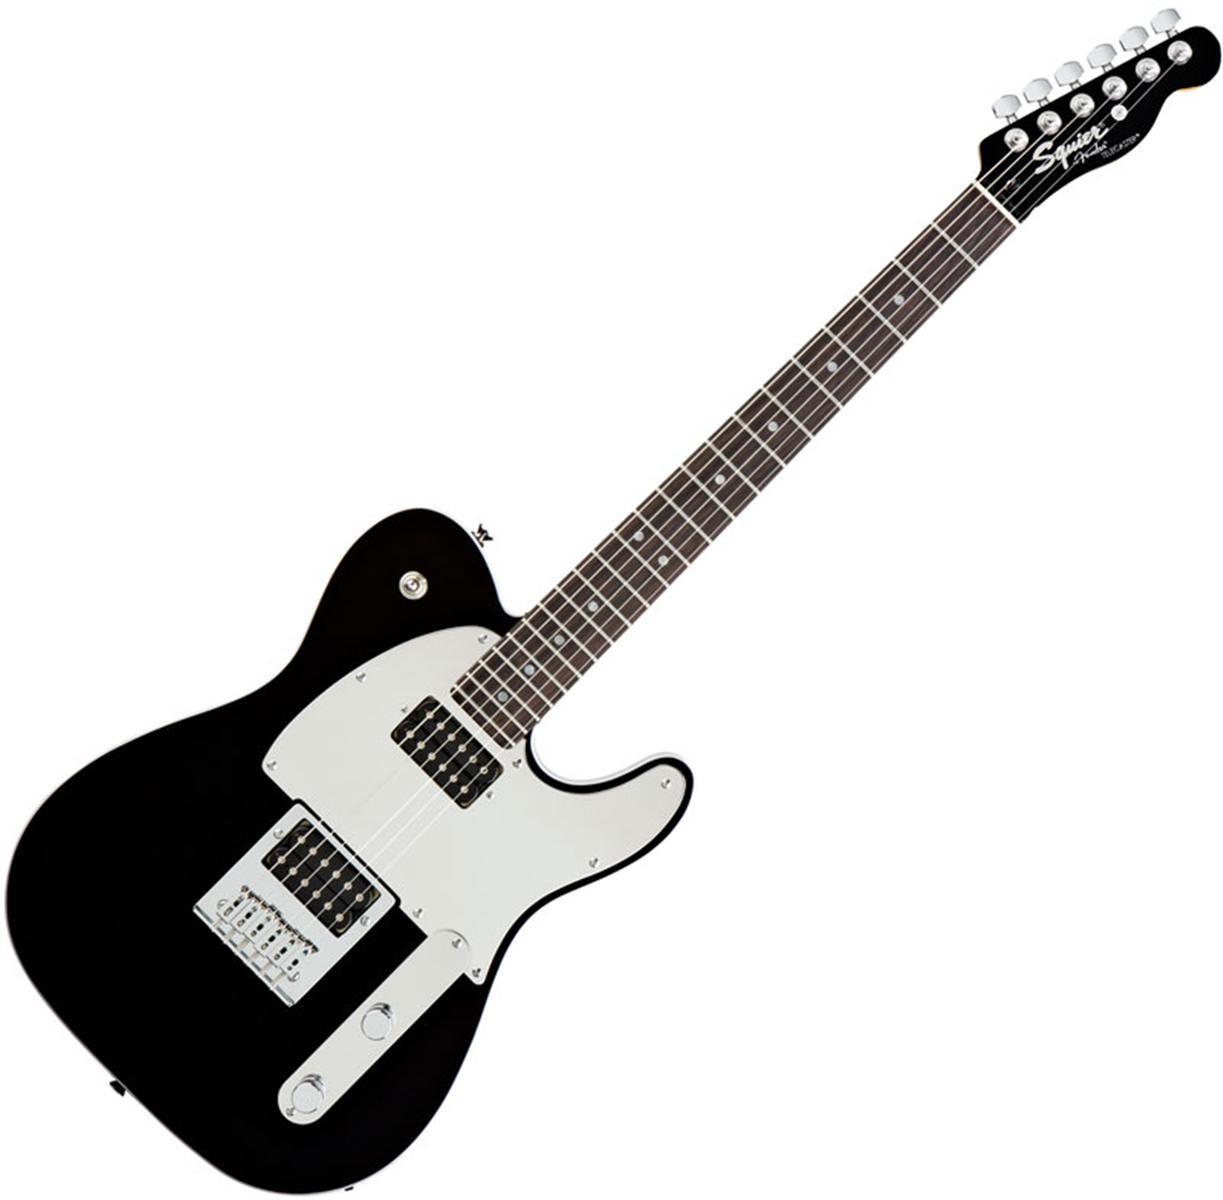 Clipart guitar clipart